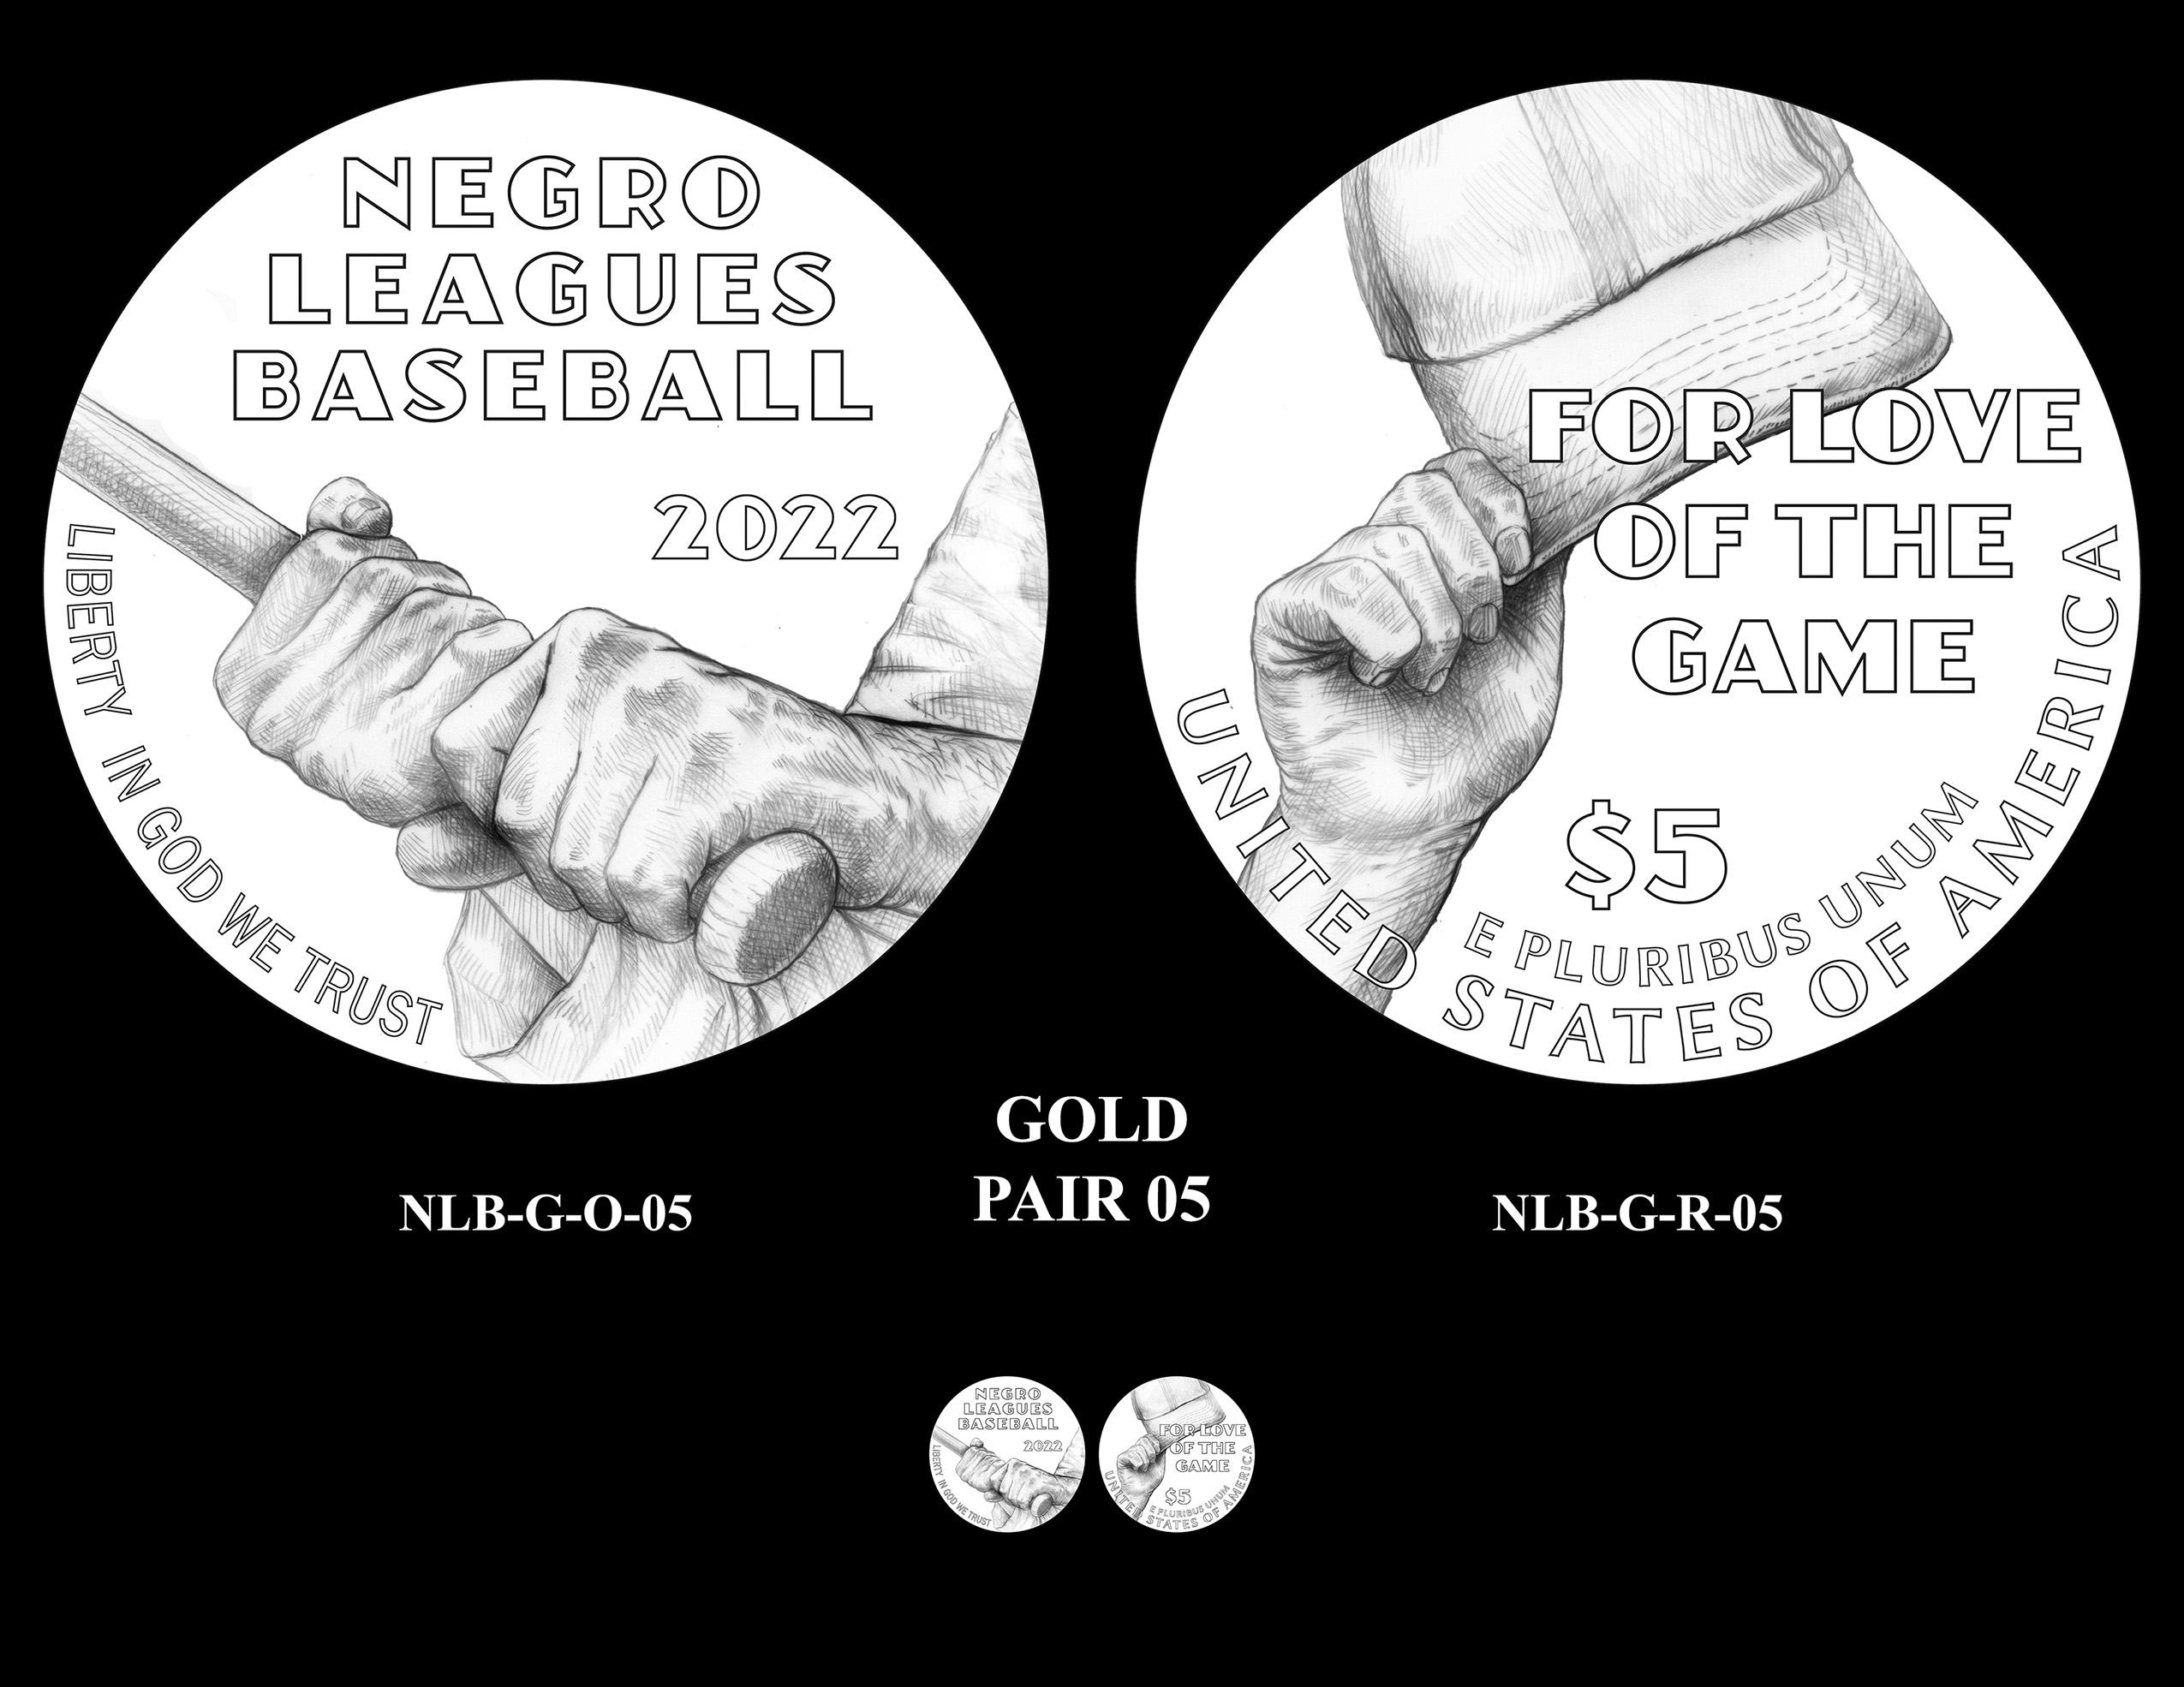 Gold Pair 05 -- Negro Leagues Baseball Commemorative Coin Program